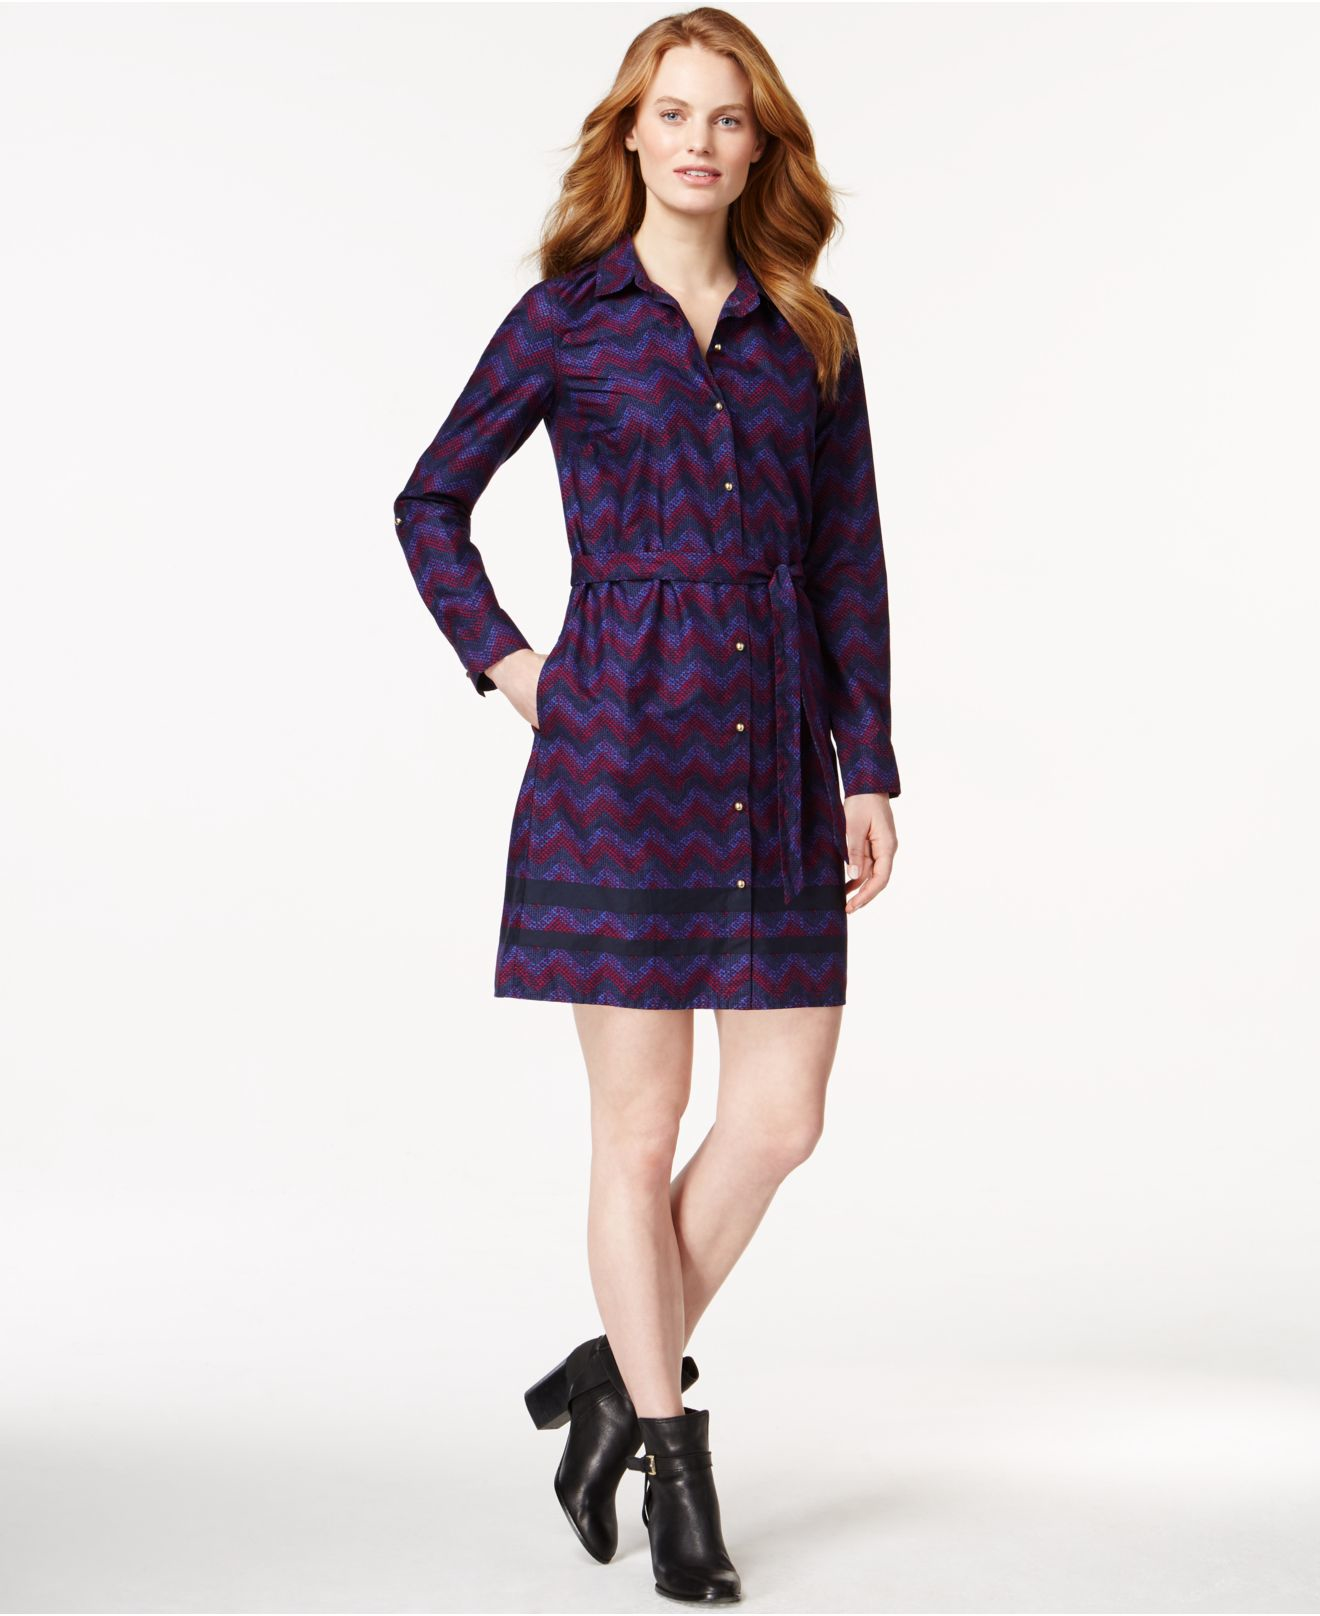 42b6fa0de7 Lyst - Tommy Hilfiger Belted Chevron-print Shirt Dress in Blue